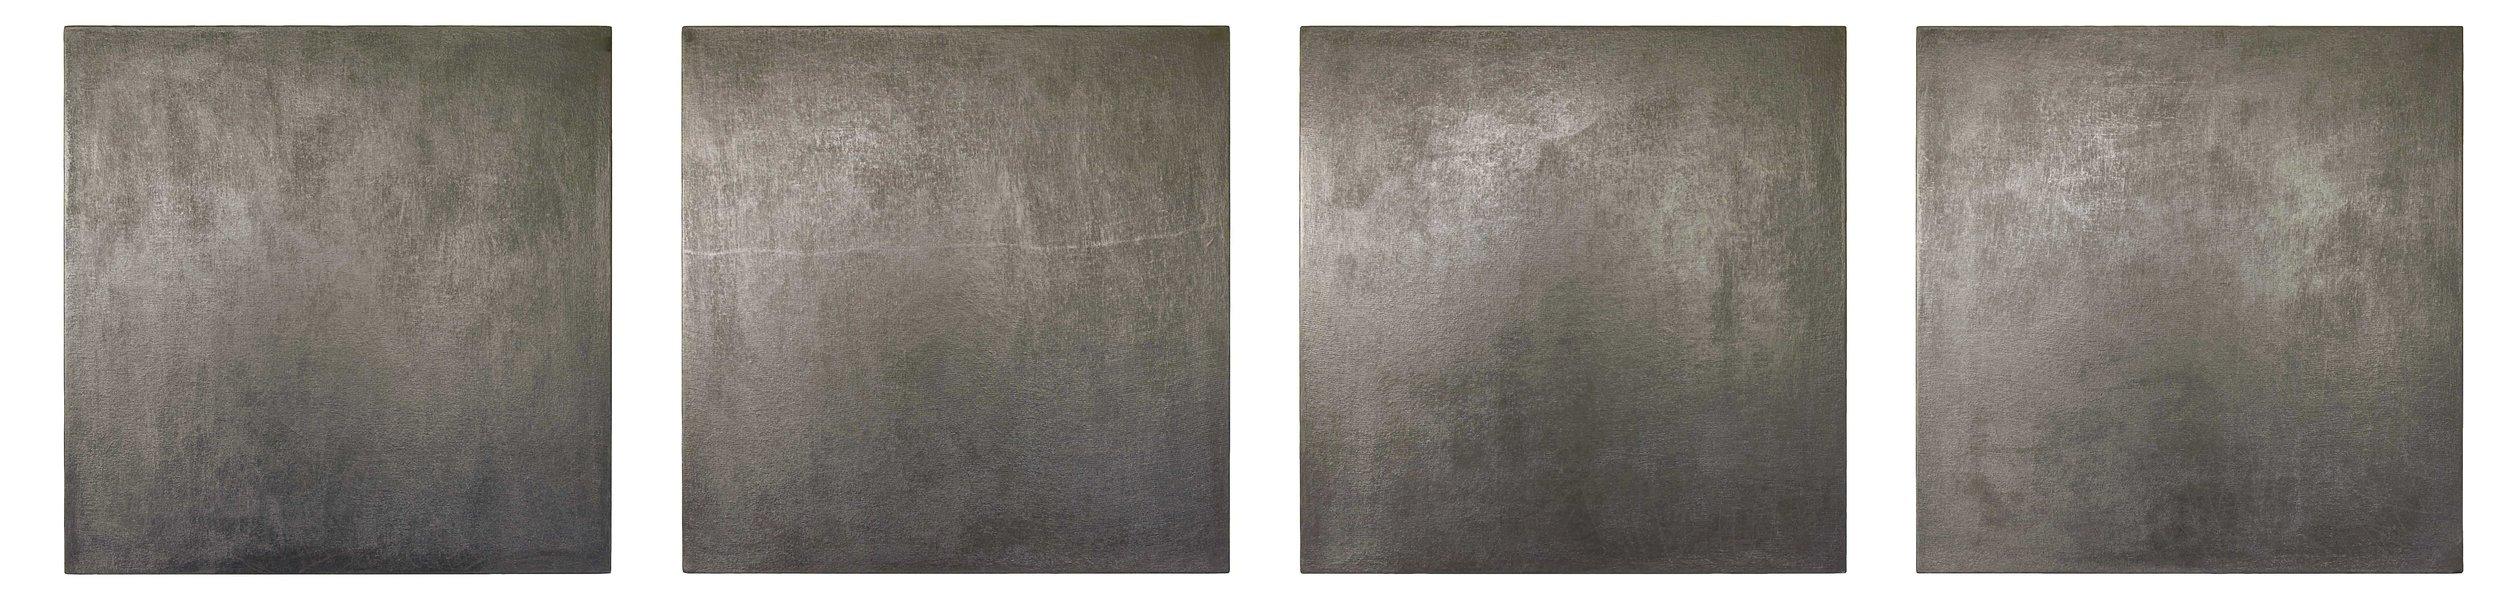 grafit, les, štirikrat 100 x 70 cm, 1998